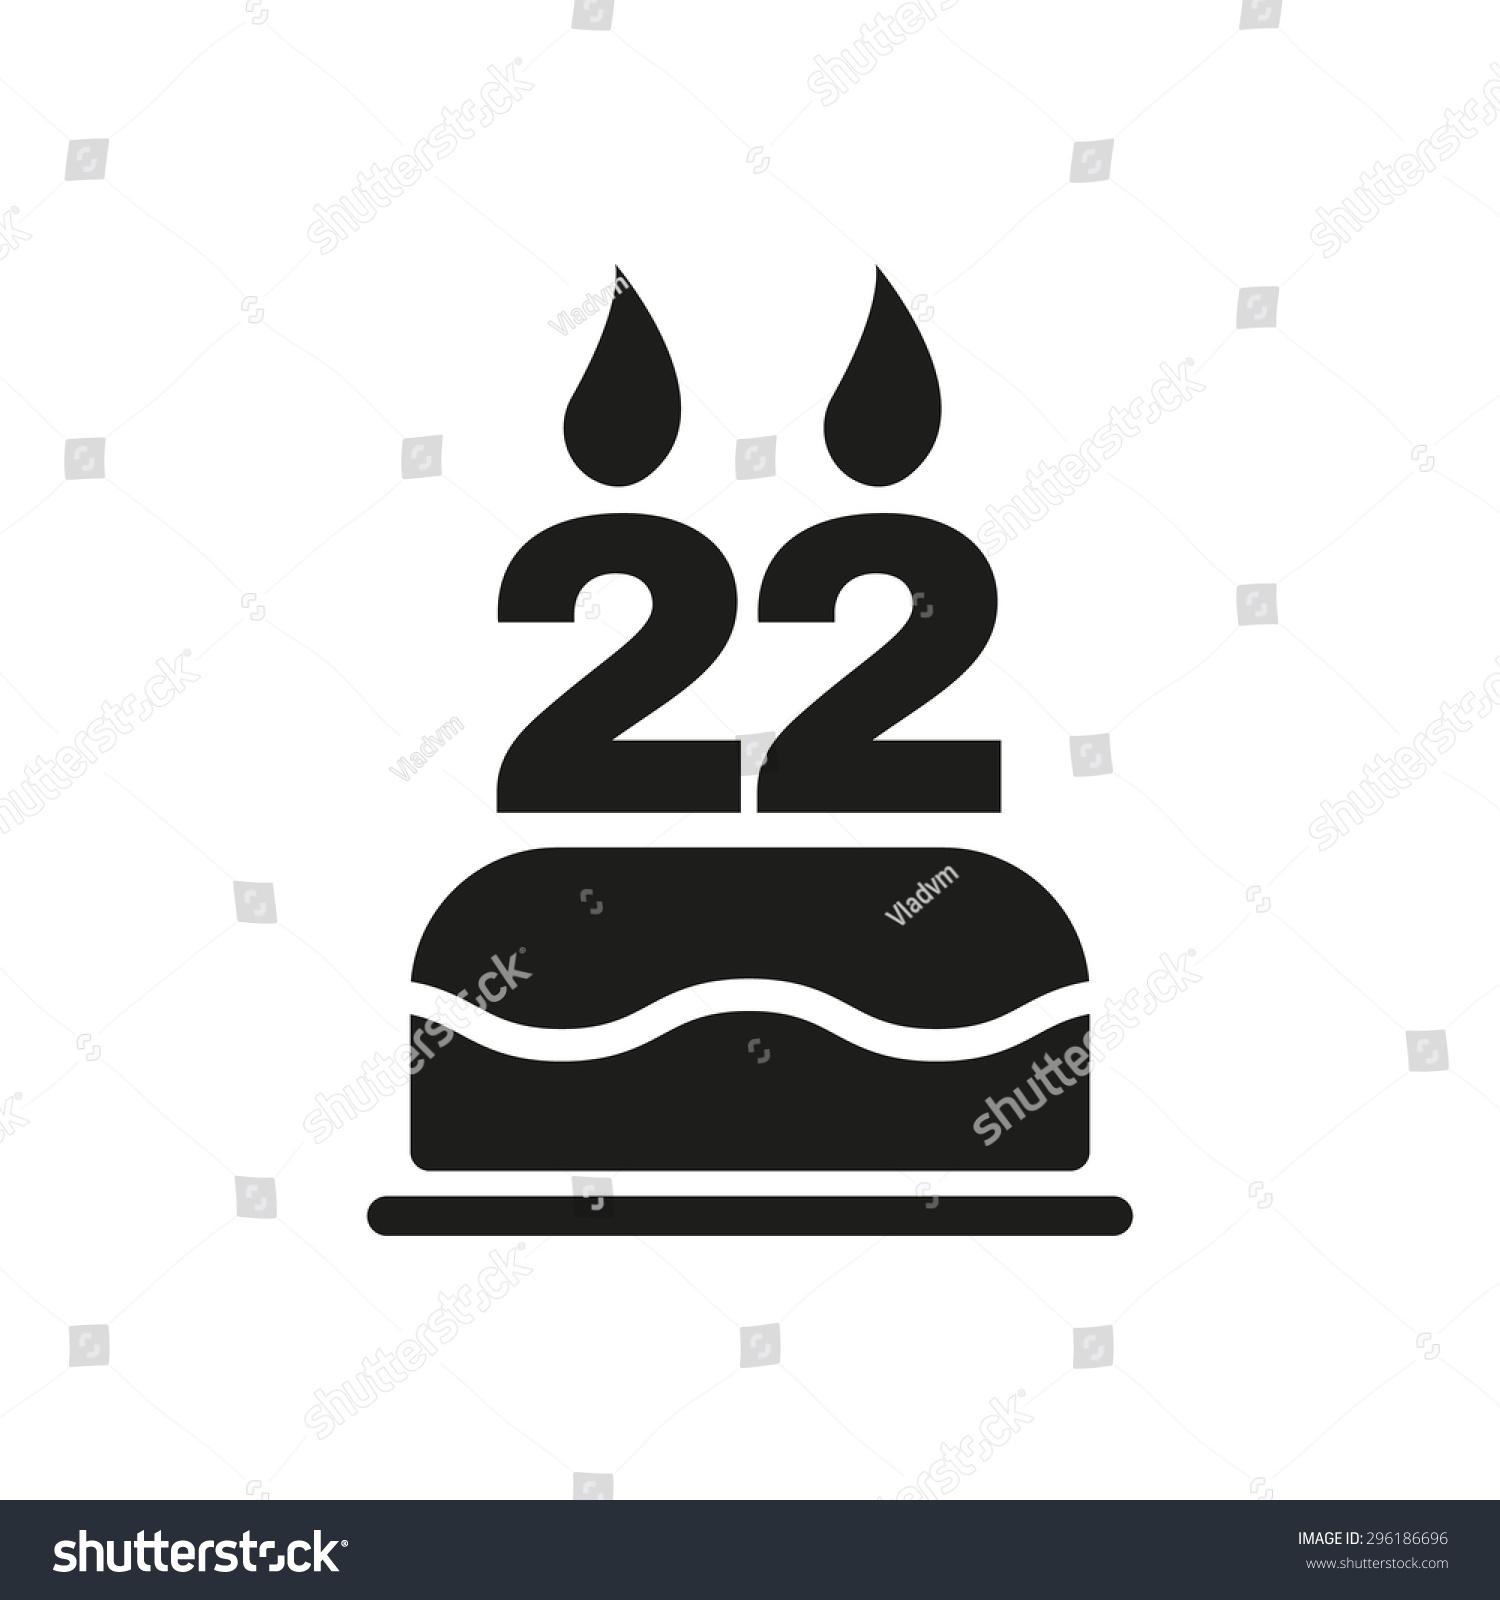 Birthday cake candles form number 22 stock vector 296186696 the birthday cake with candles in the form of number 22 icon birthday symbol biocorpaavc